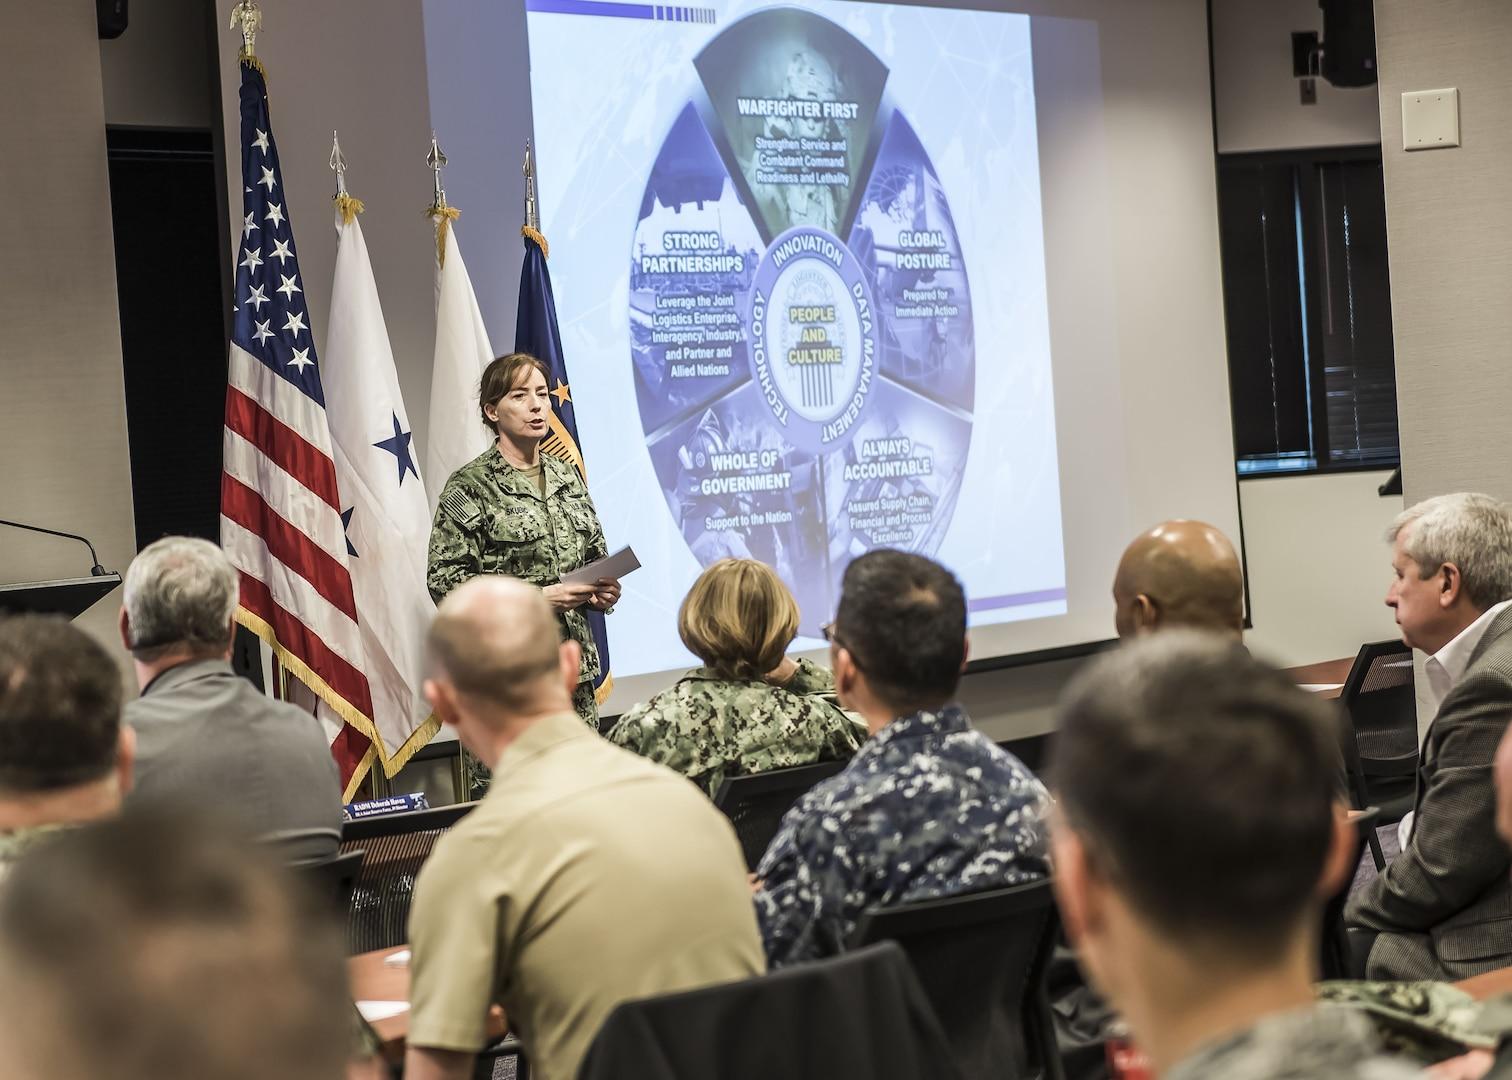 U.S. Navy Rear Adm. Michelle Skubic presented the DLA director's strategic plan during the Dec. 1 JFOS at DSCC.